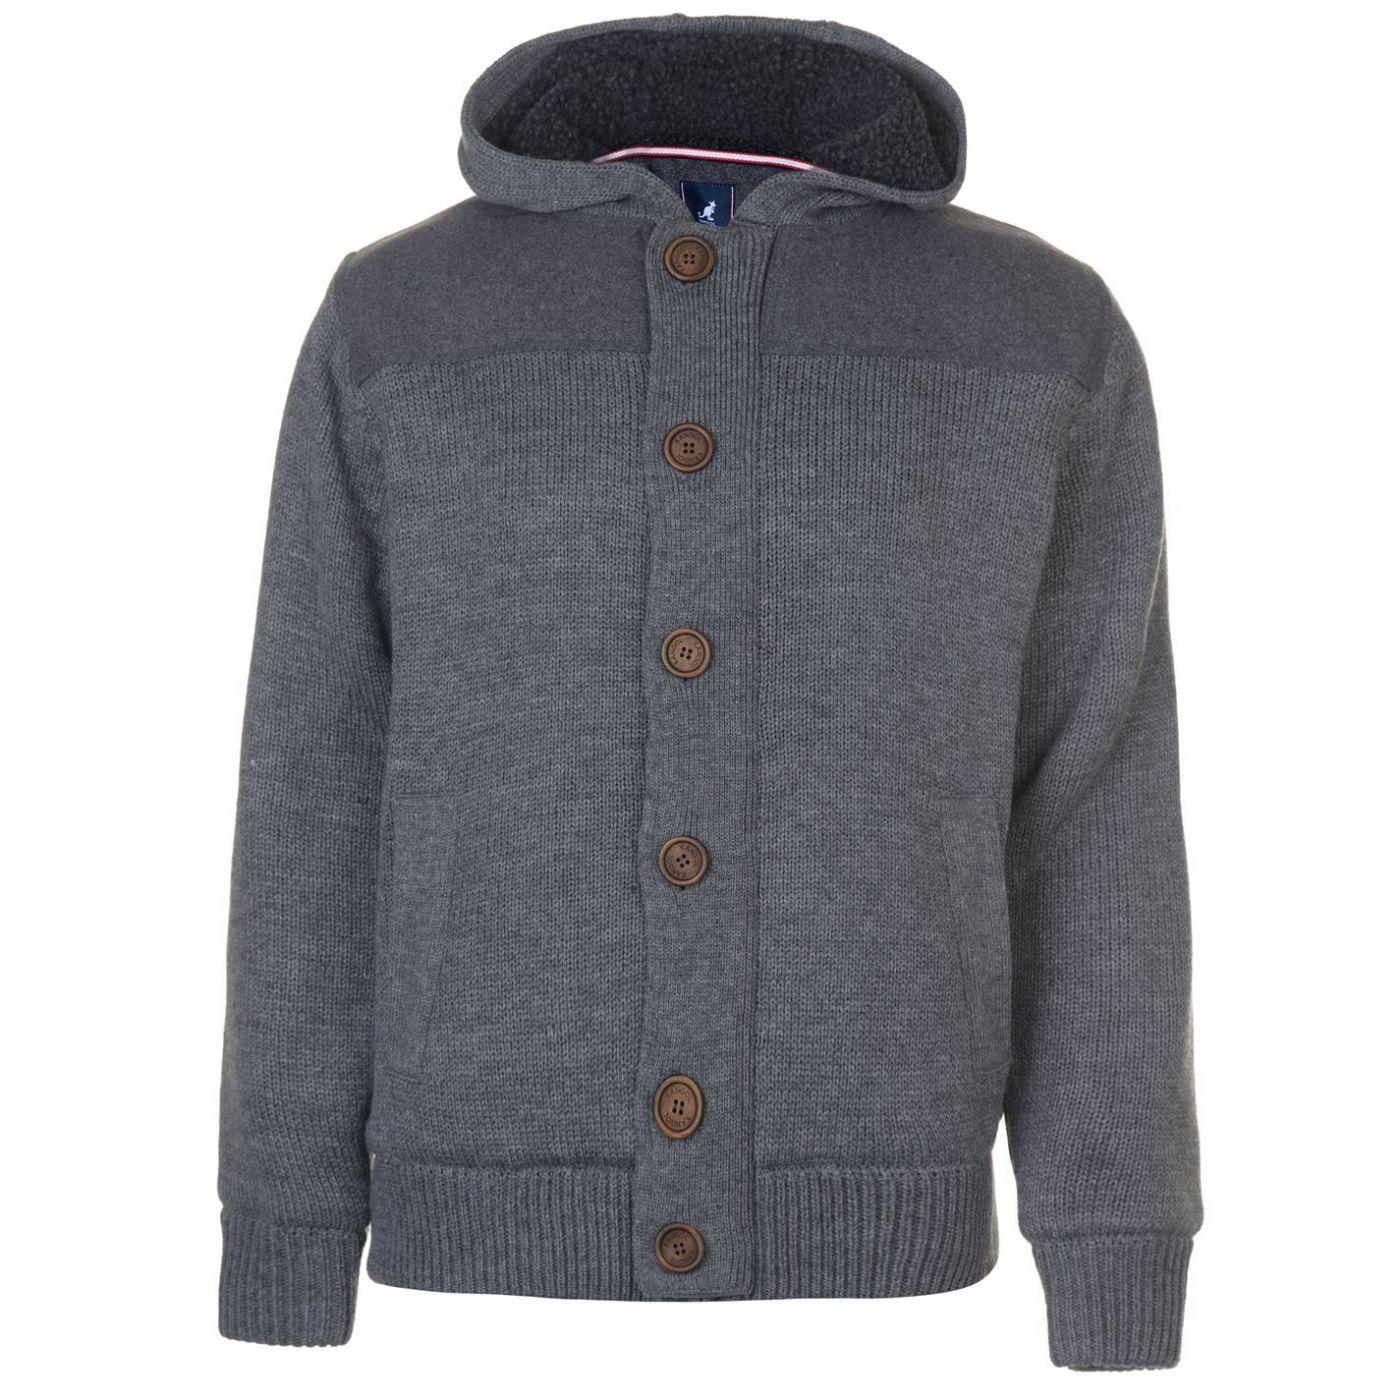 Kangol Button Lined Knit Cardigan Mens